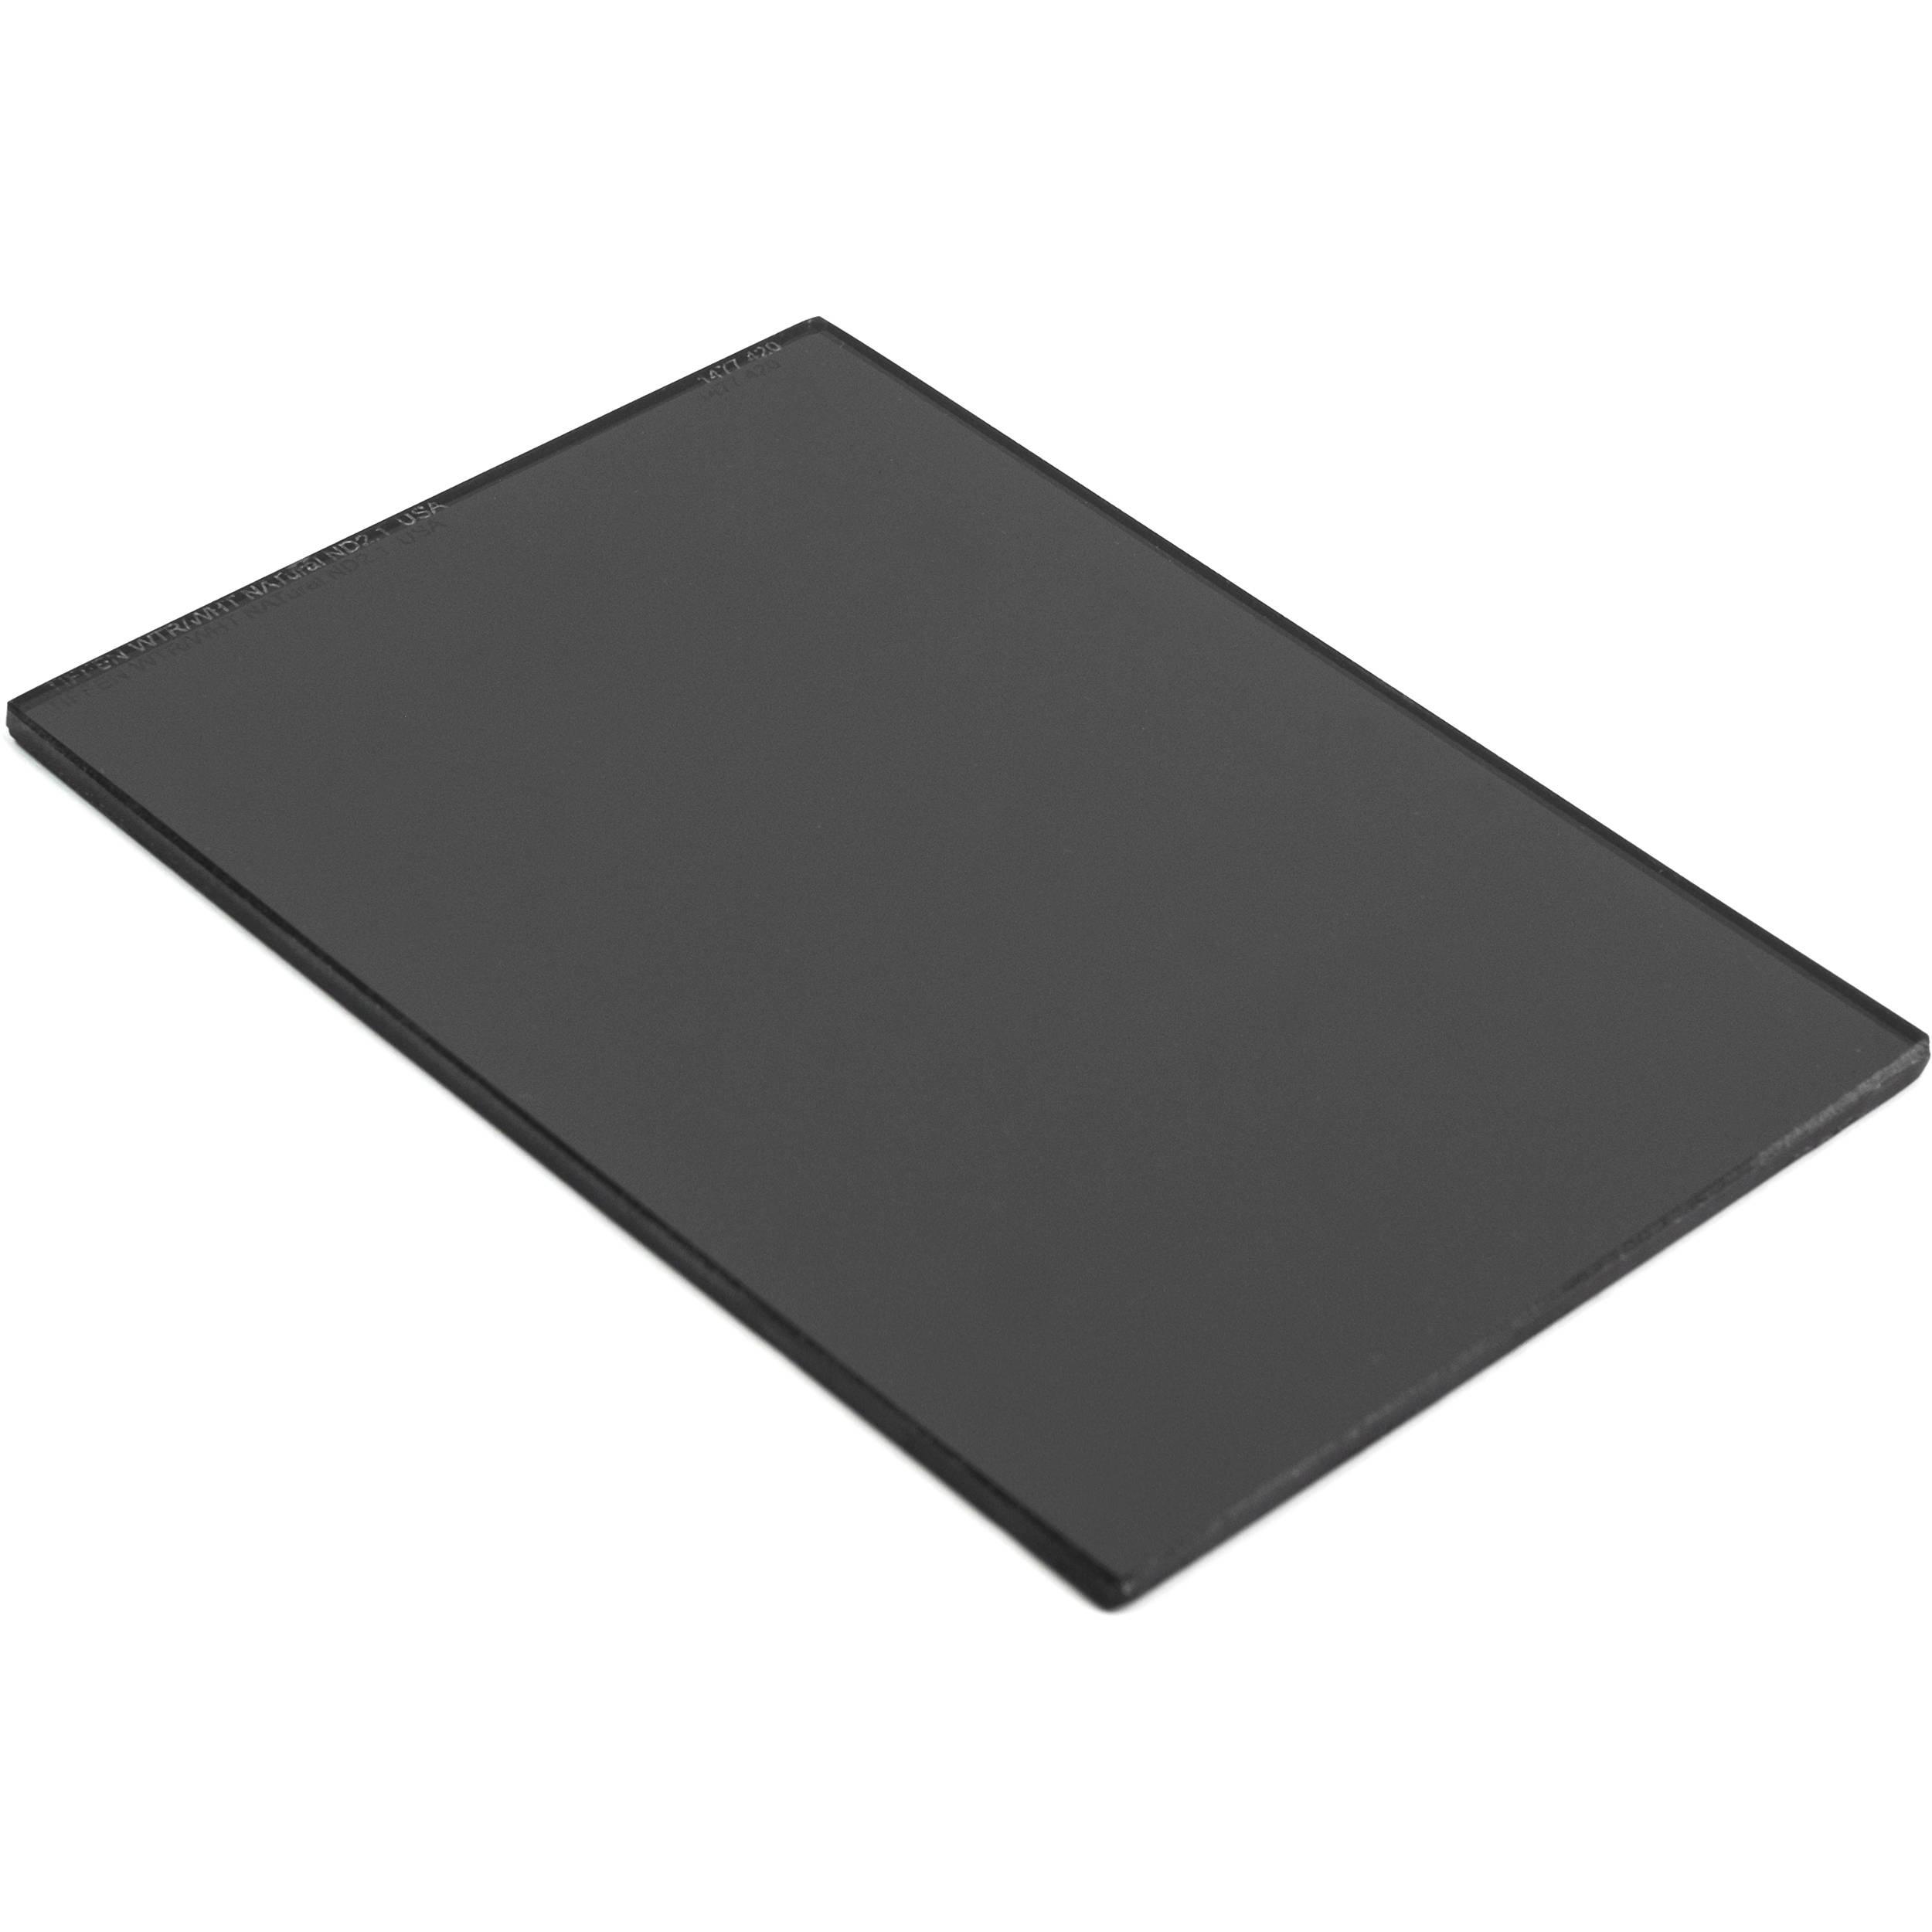 "Tiffen 4 x 5.65"" Water White ND 2.1 Filter (7-Stop)"